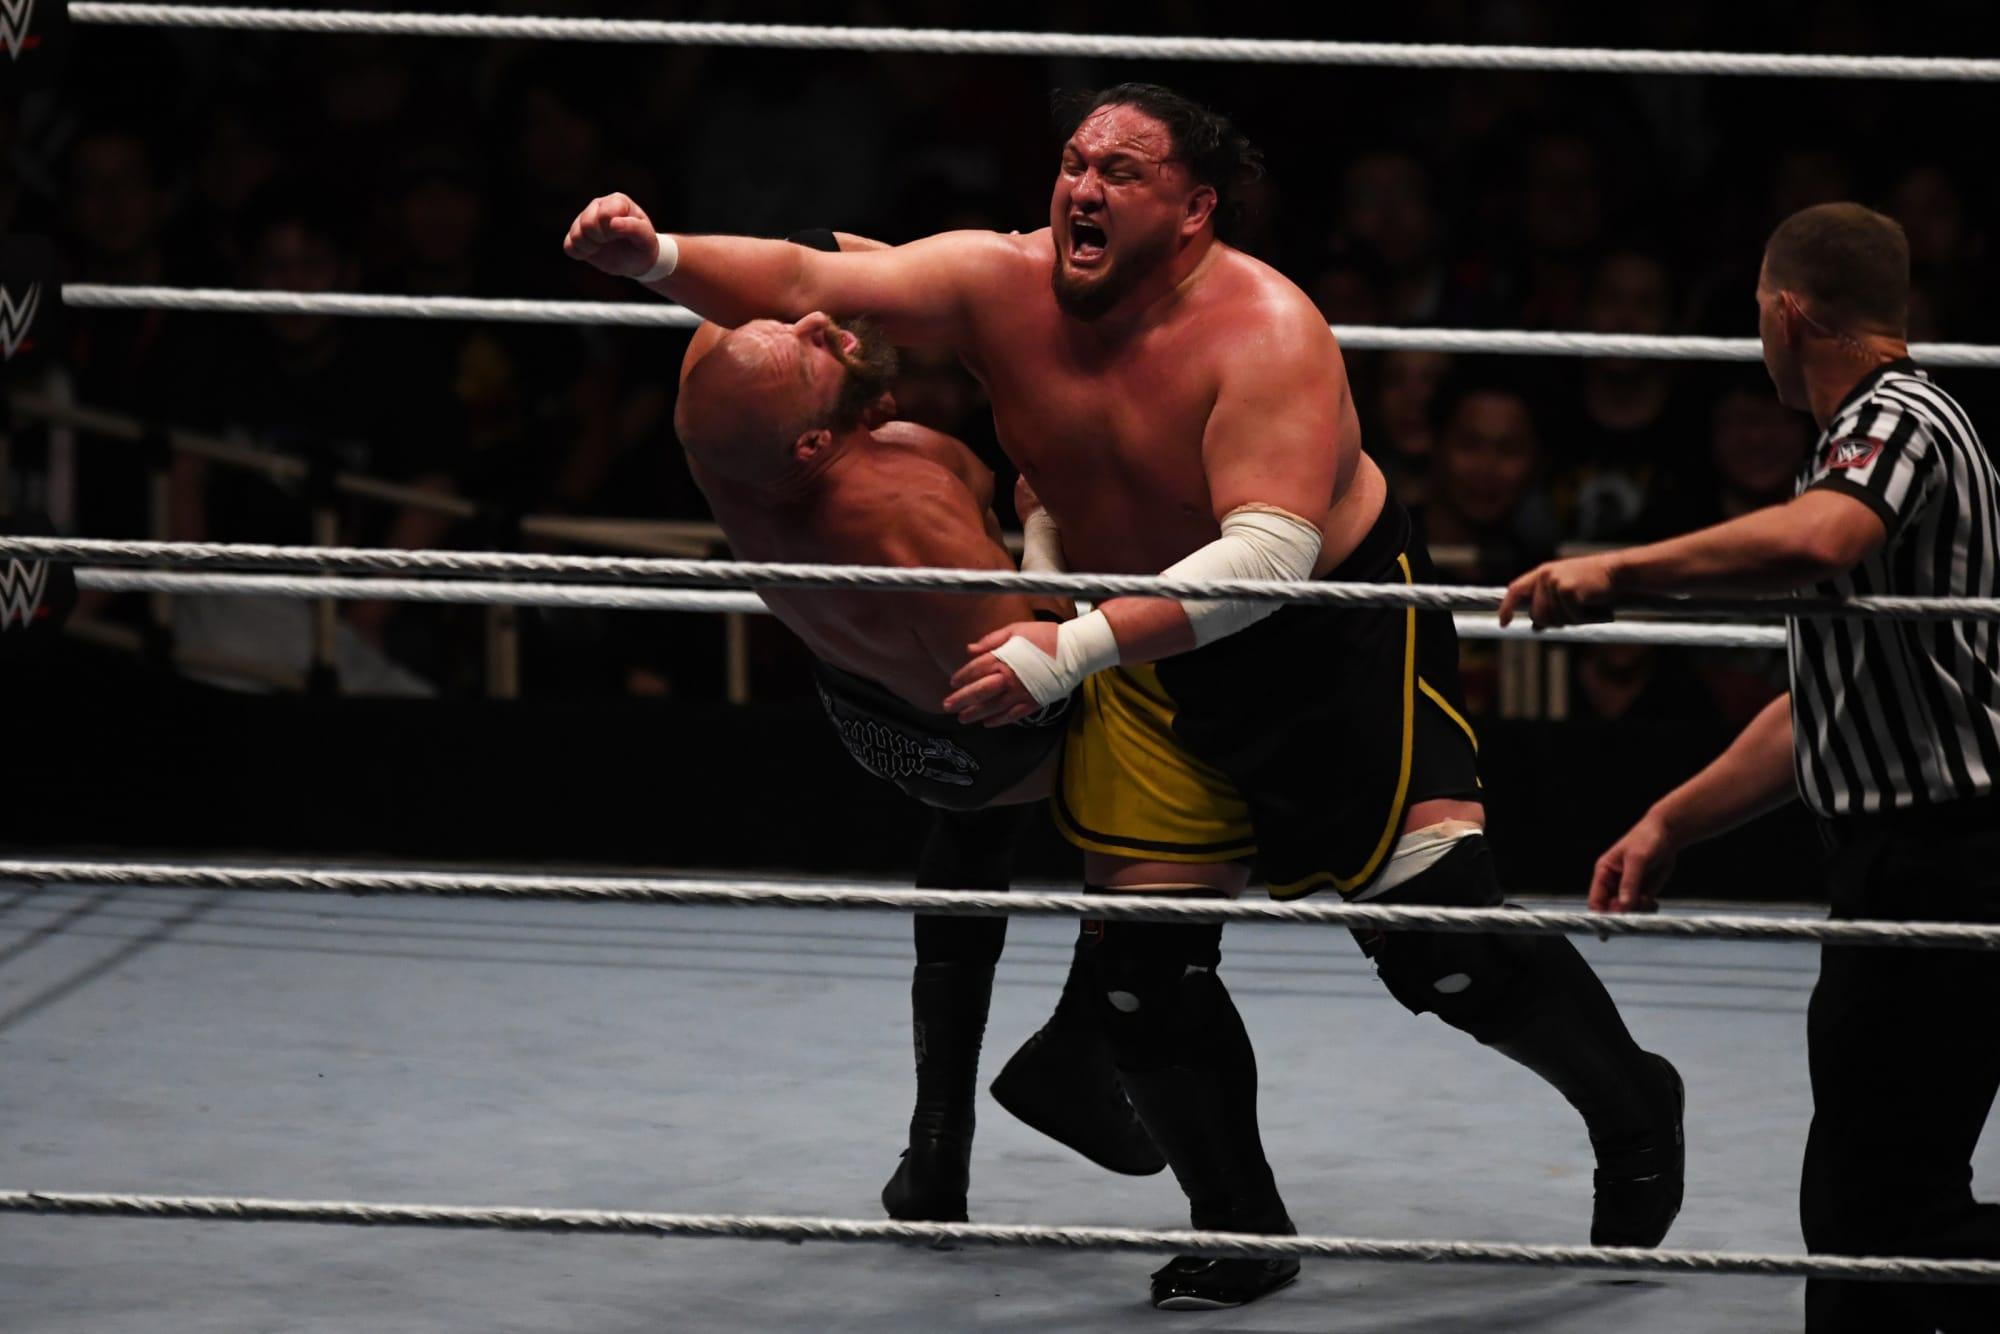 Samoa Joe headed back to NXT via Wrestling Observer Radio